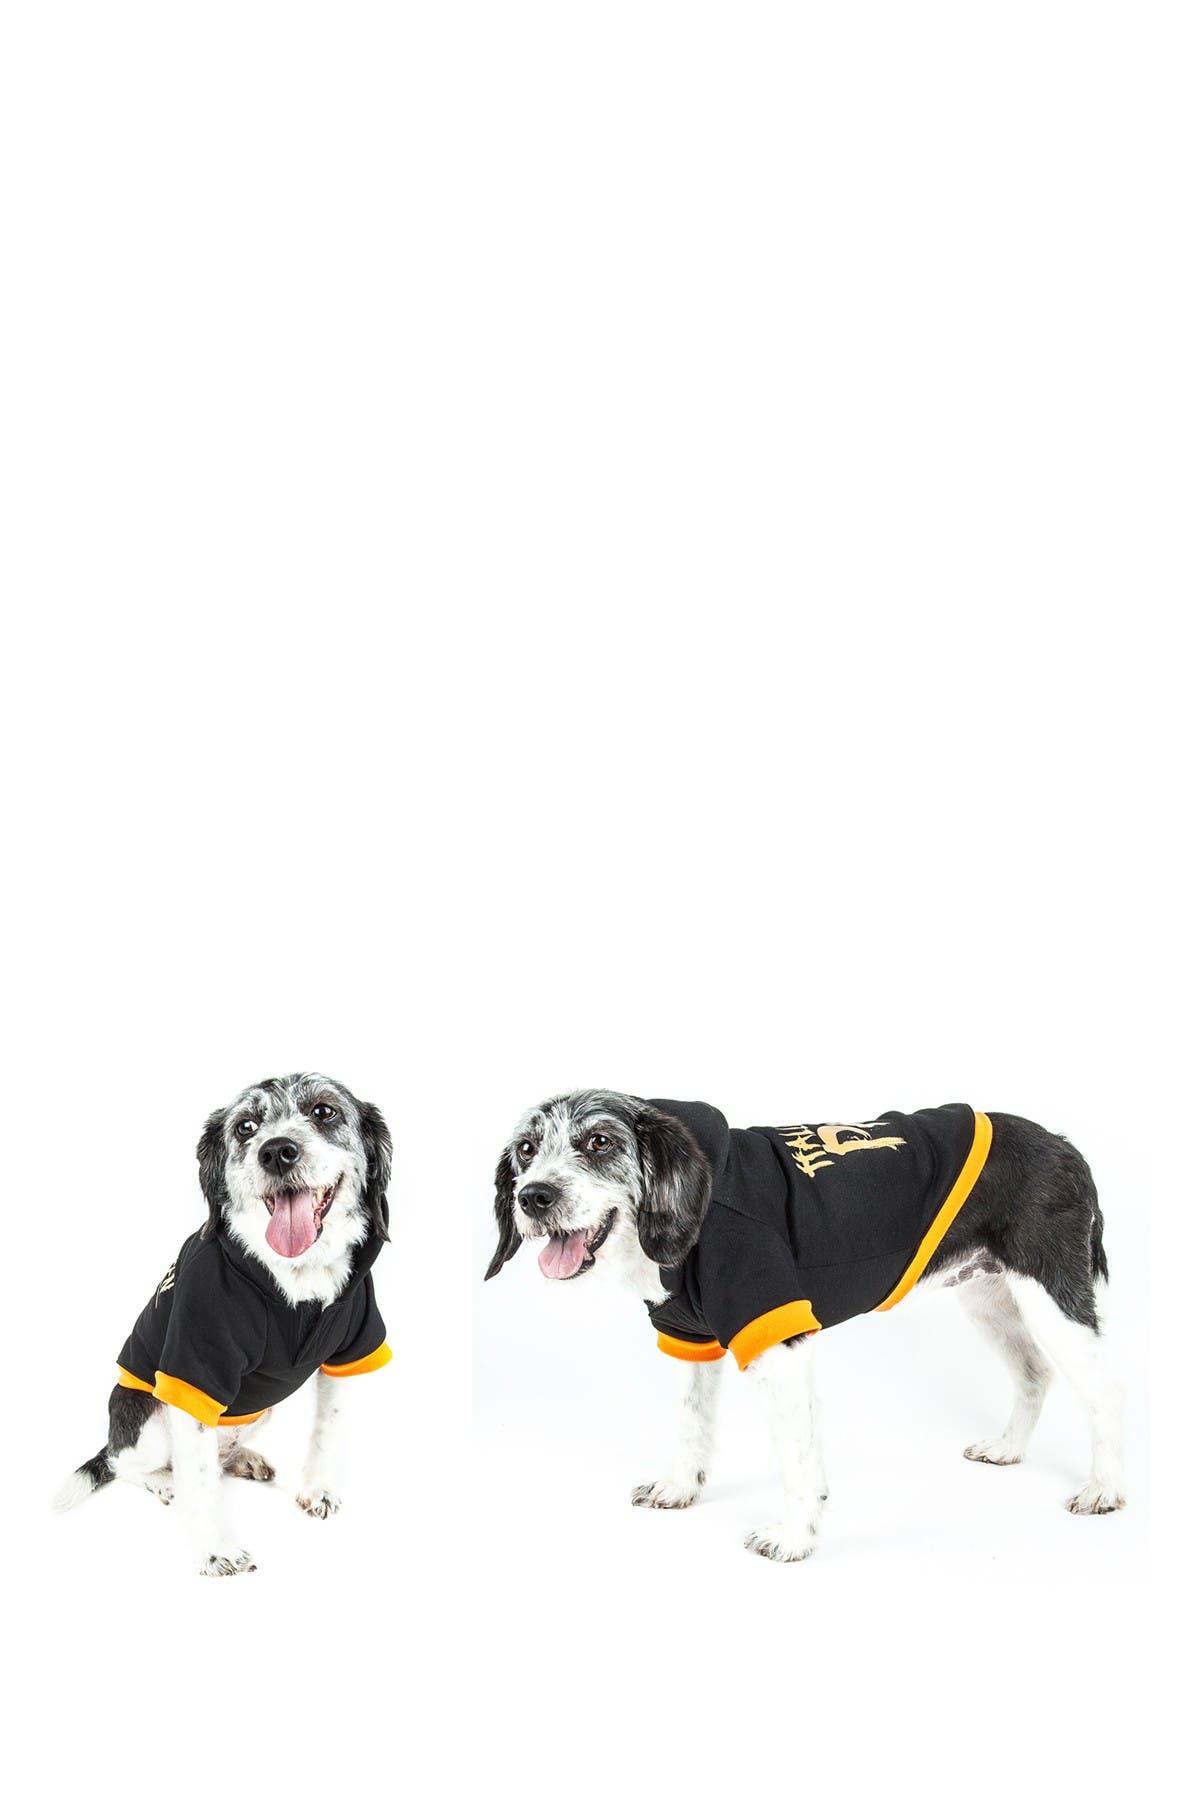 Image of PETKIT Pet Life LED Lighting Halloween Party Hooded Sweater Pet Costume - Medium